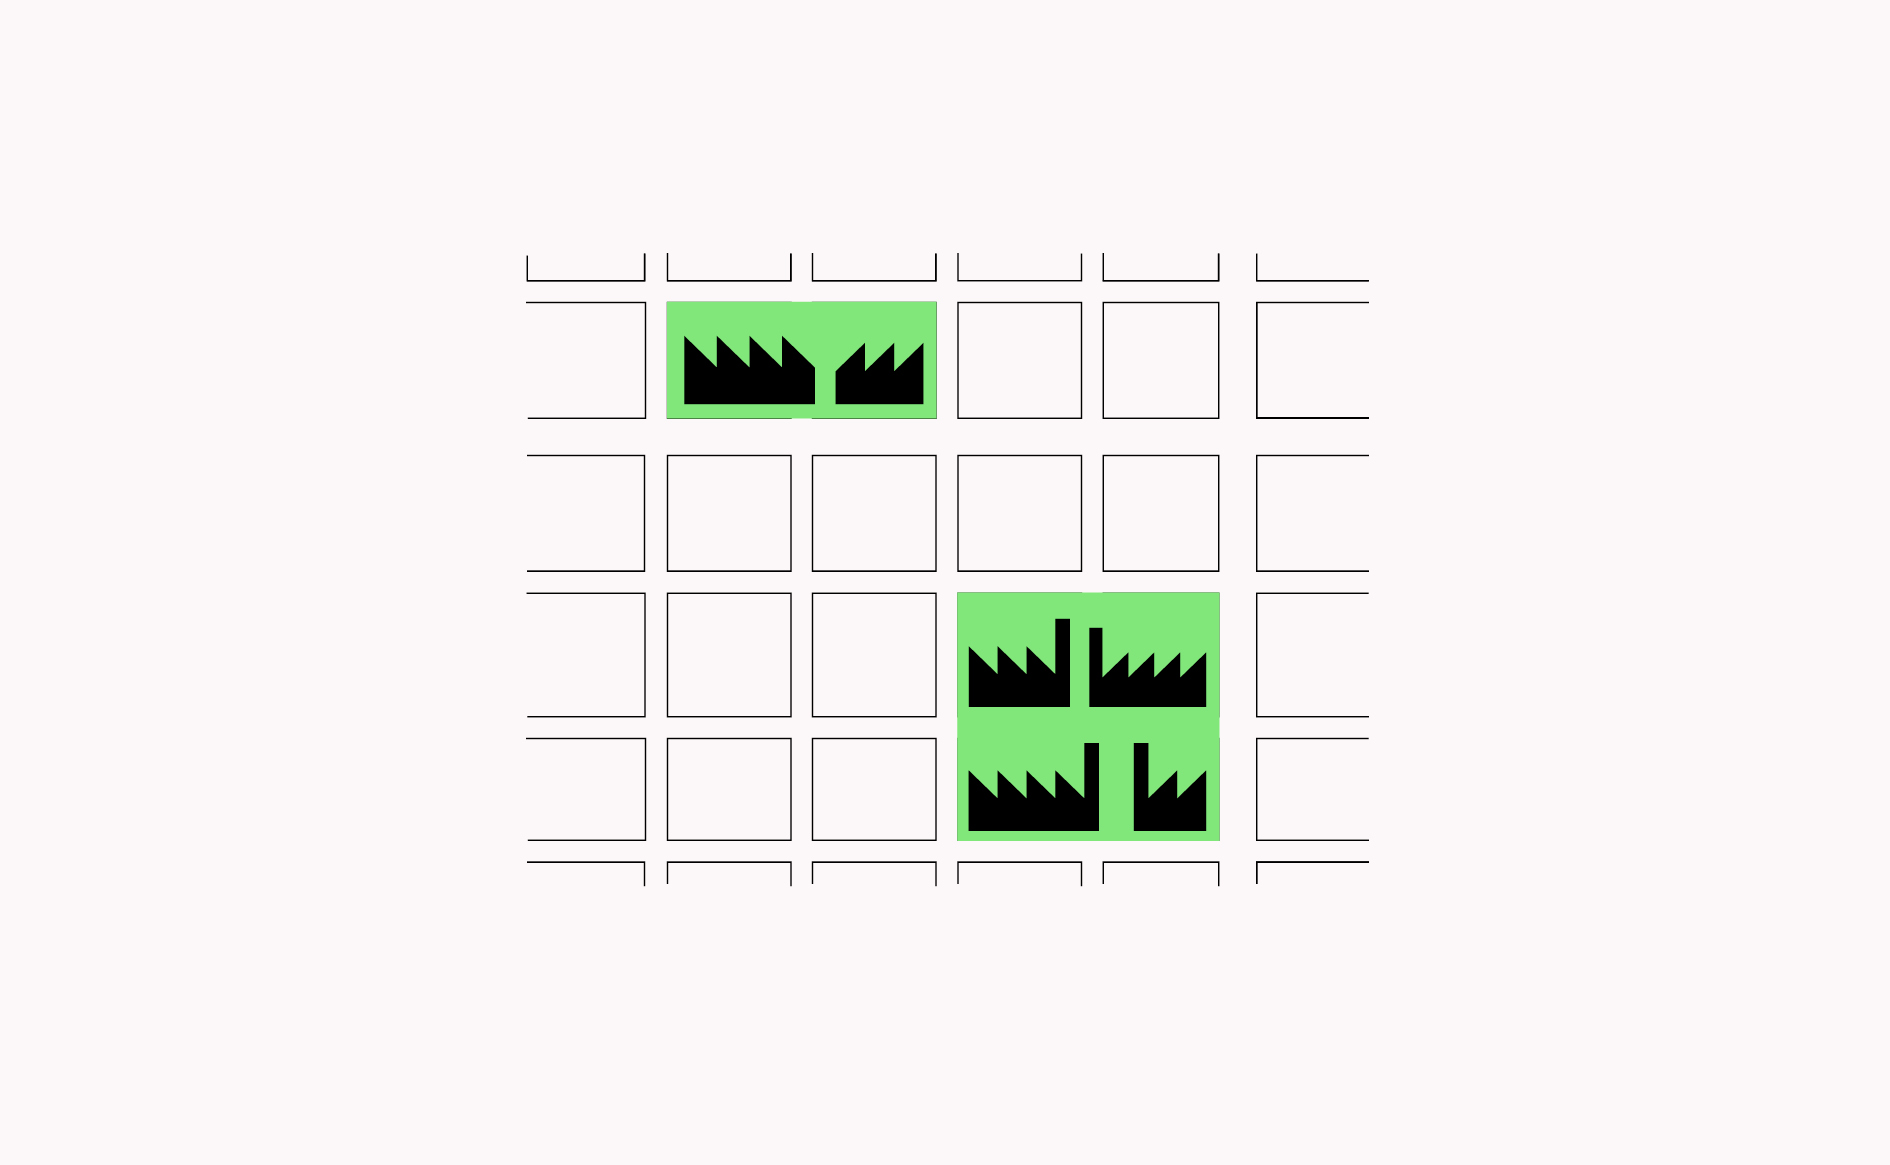 N.4 Clustering Similar Making